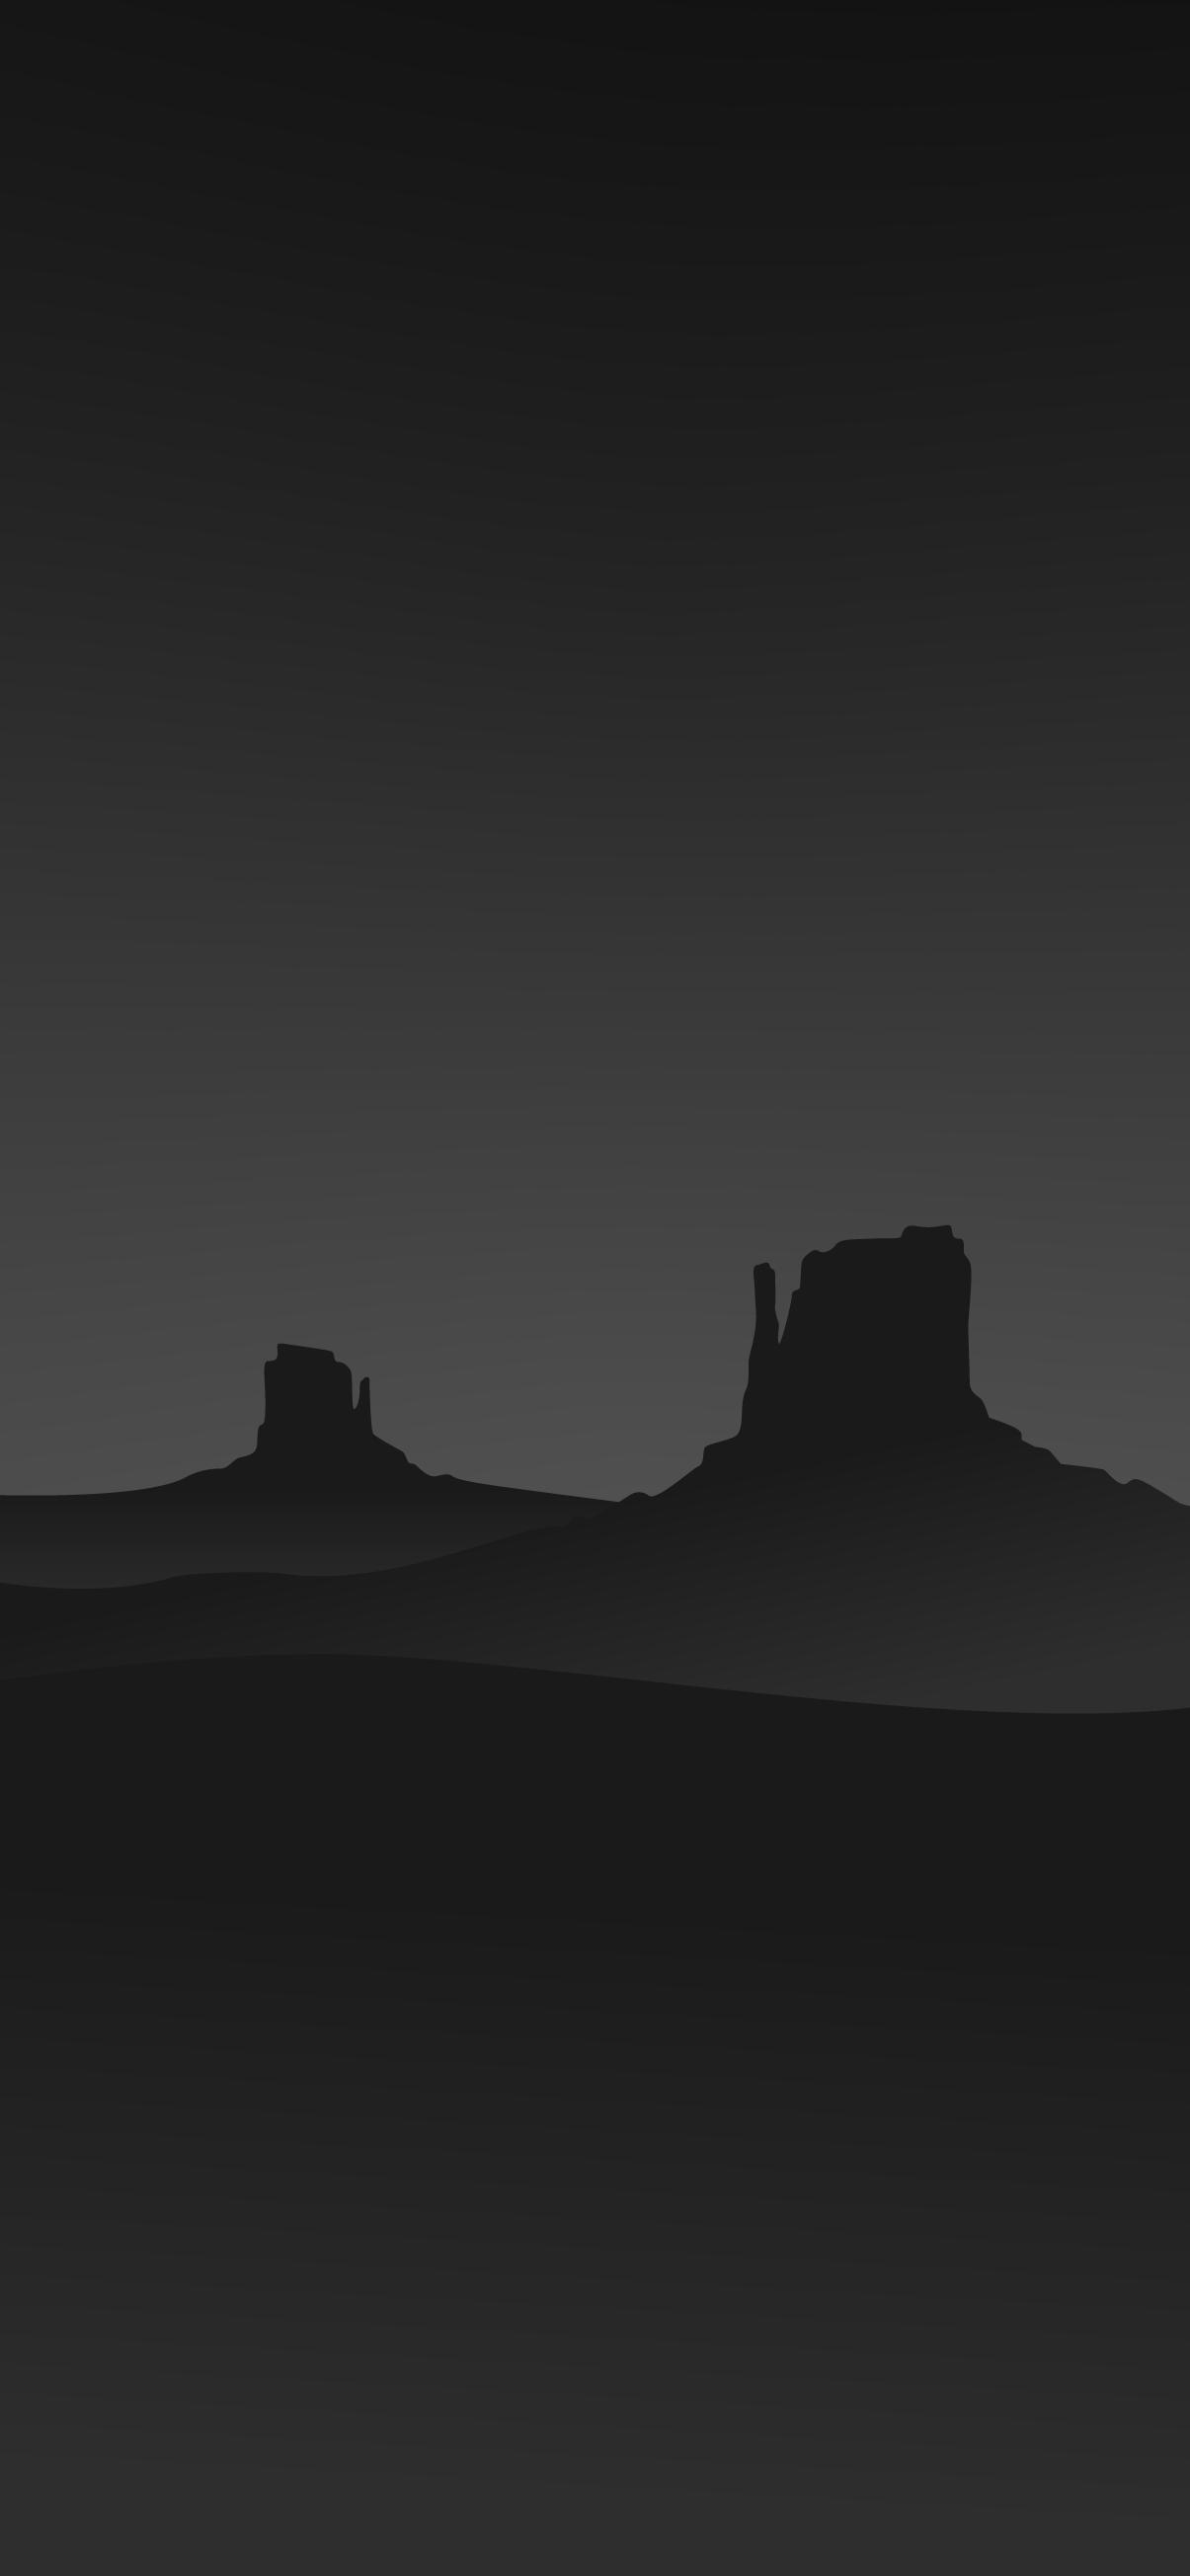 minimalist-grey-wallpaper-iphone